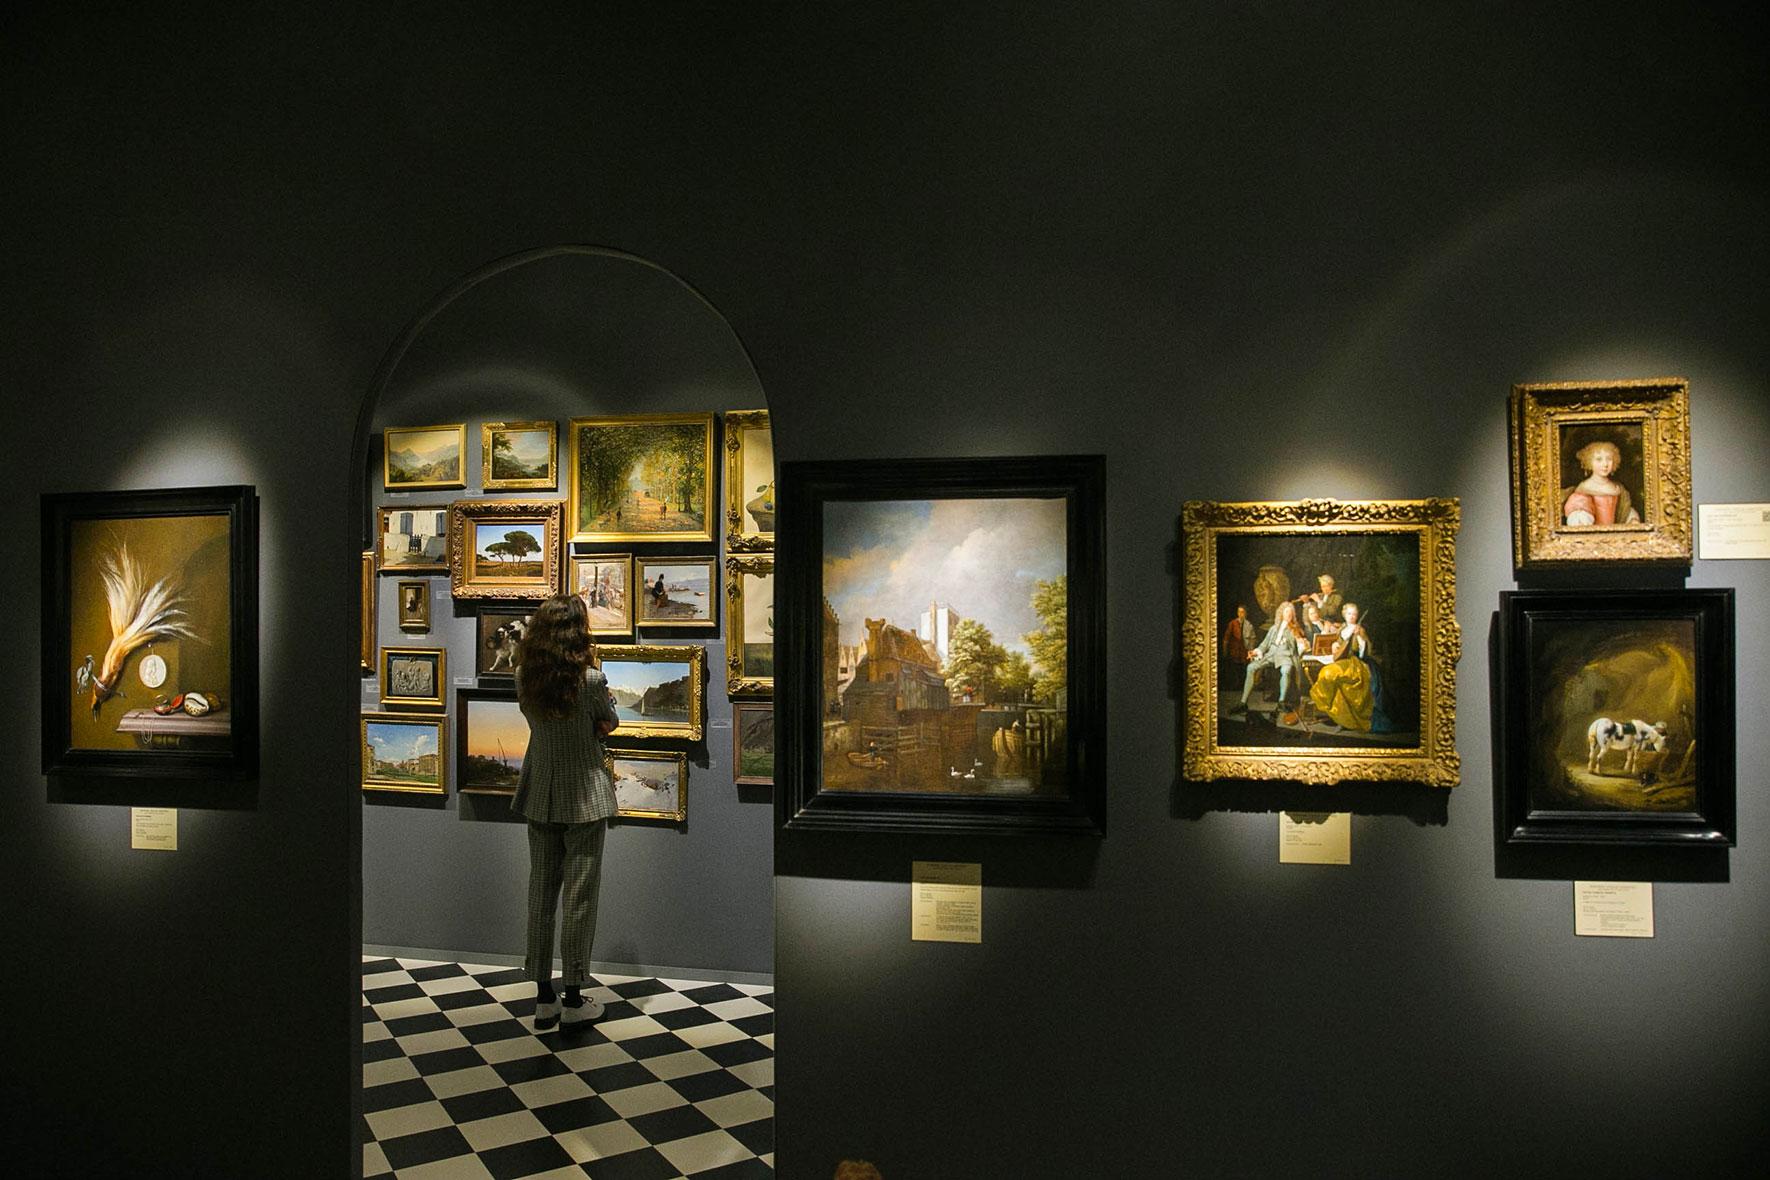 Objets d'art